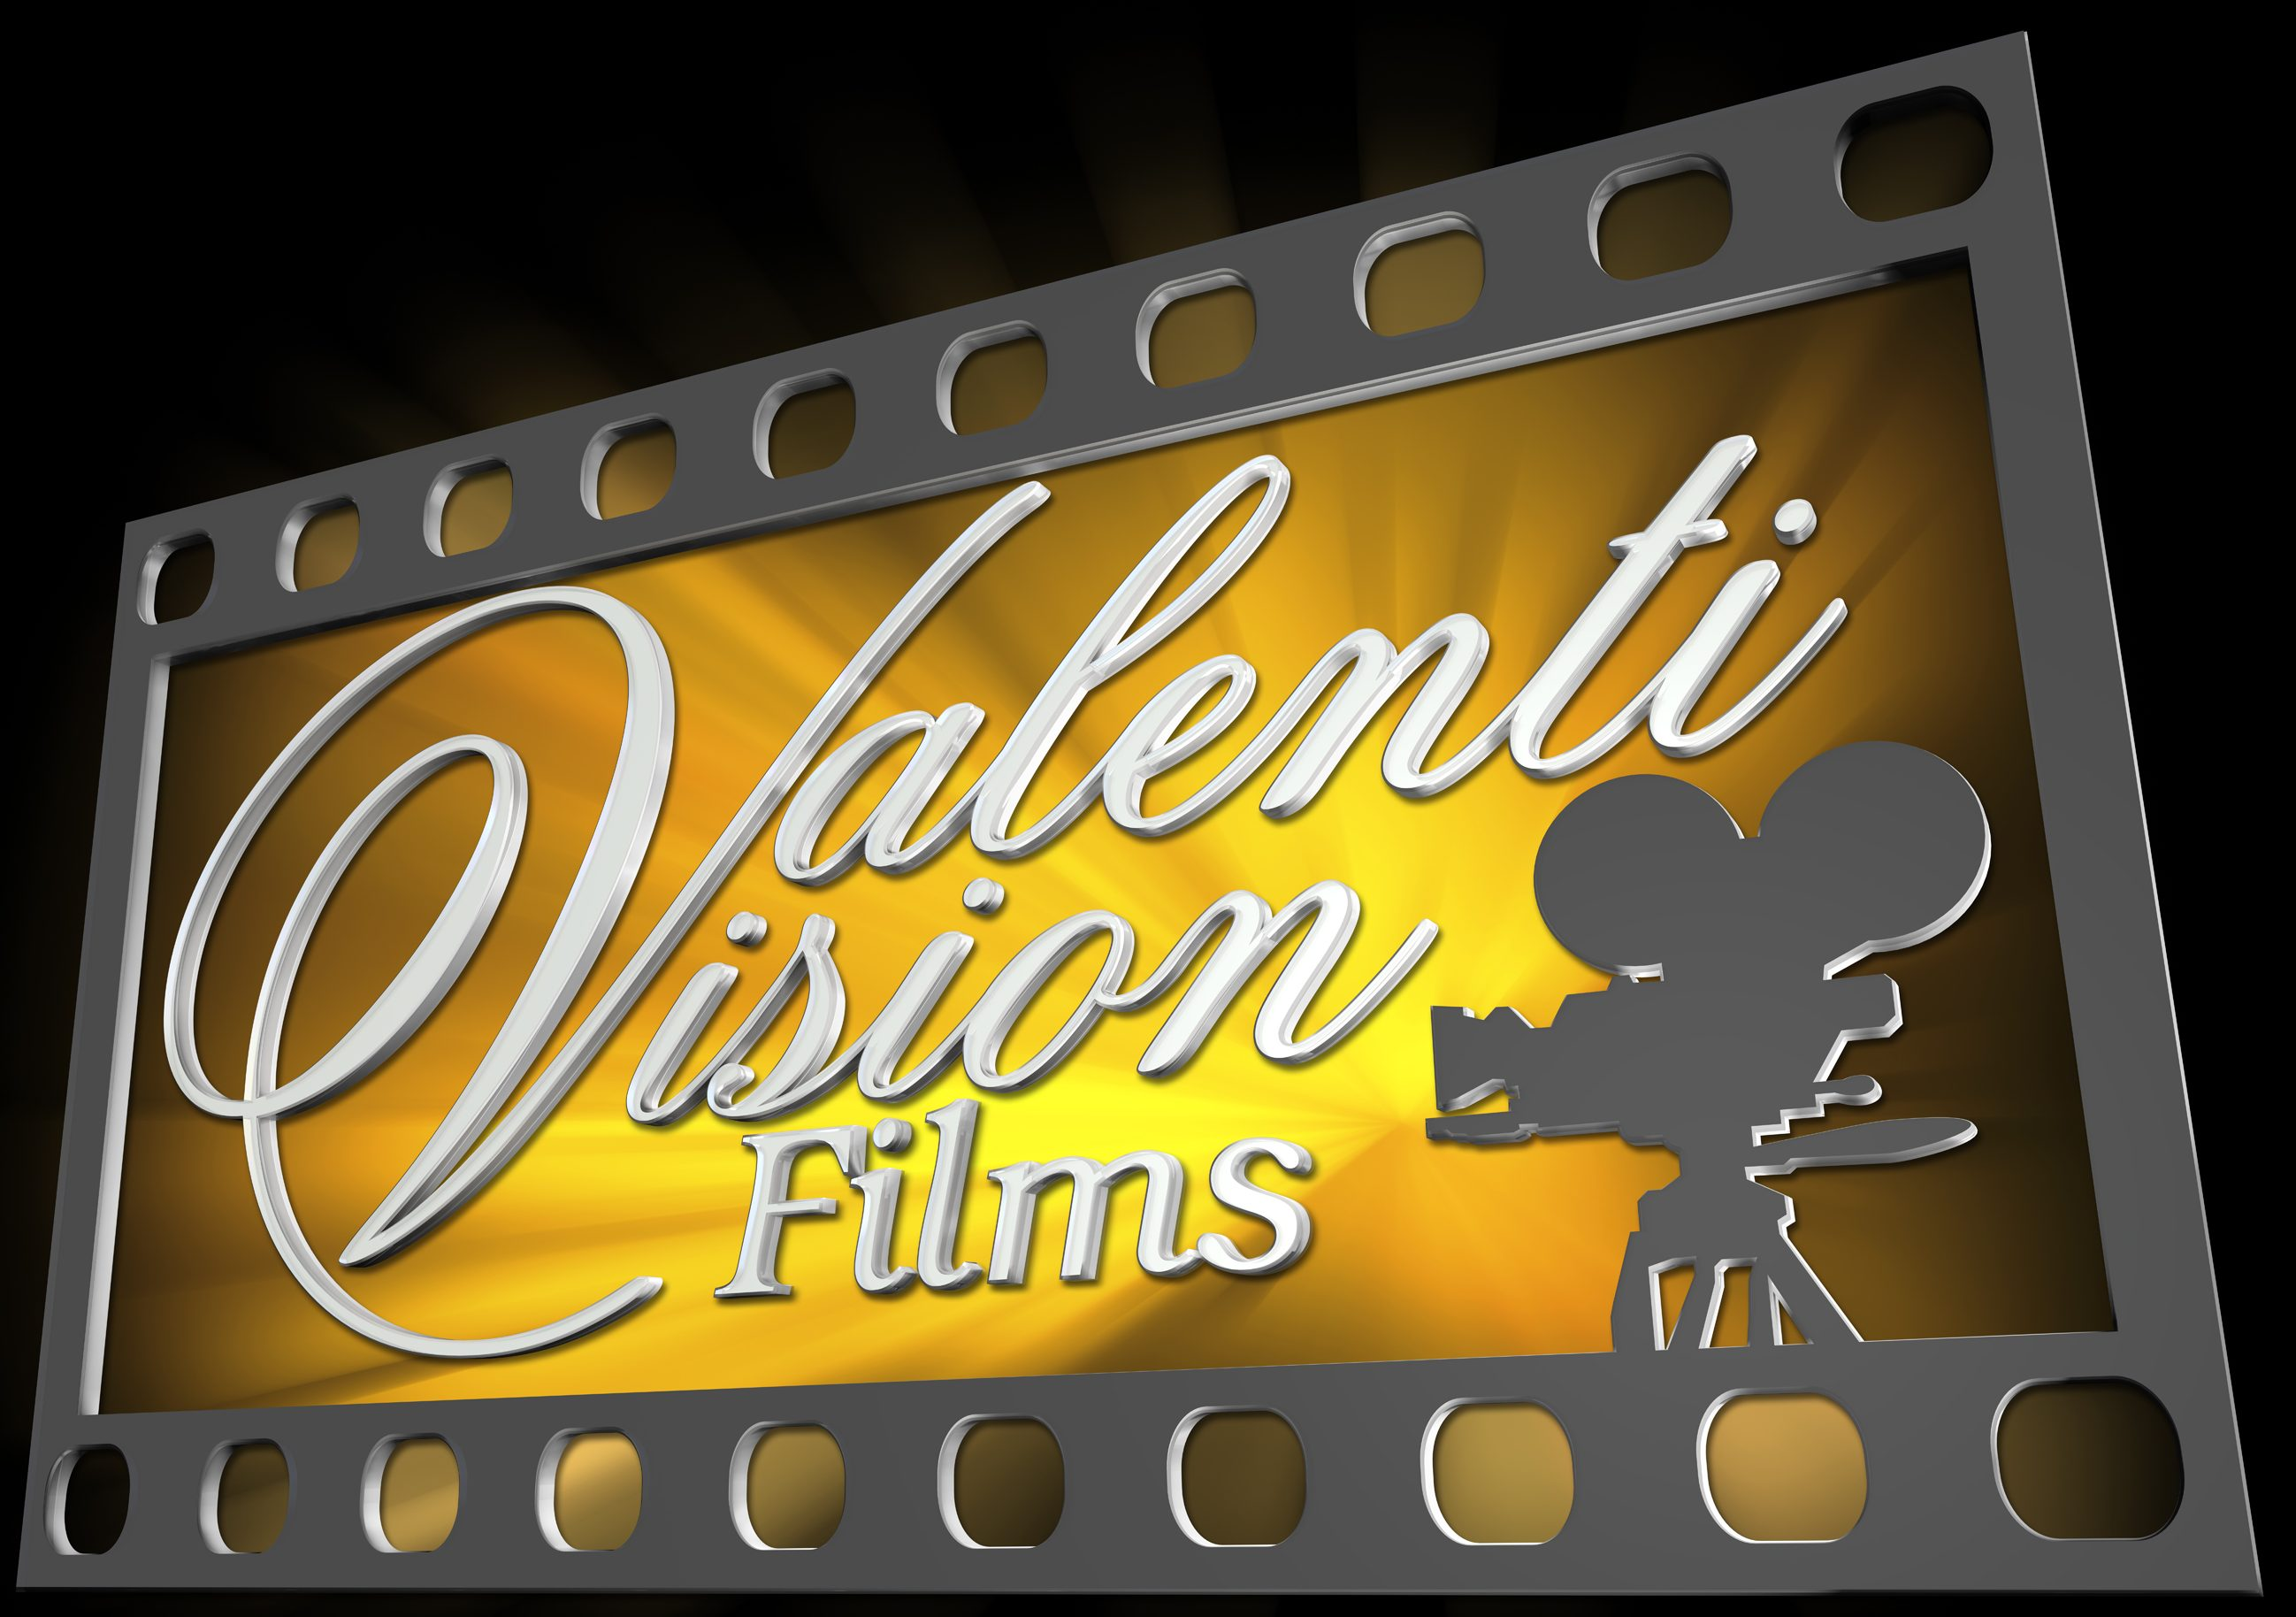 VALENTI VISION FILMS